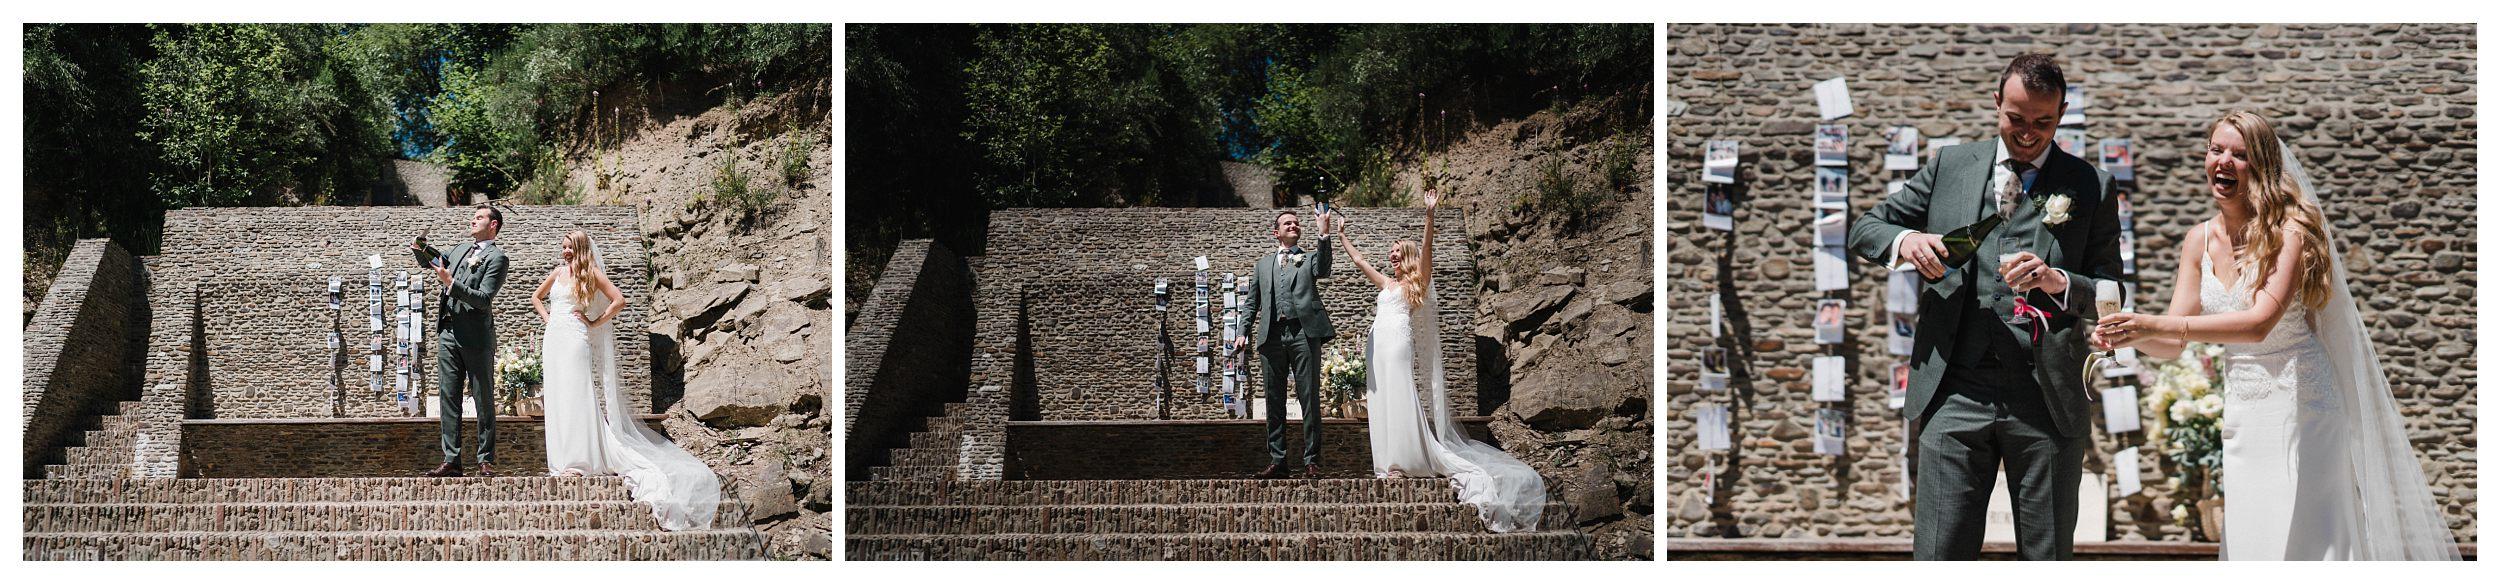 huwelijksfotograaf bruidsfotograaf destinationwedding huwelijksfotografie in ardennen nederland (72).jpg